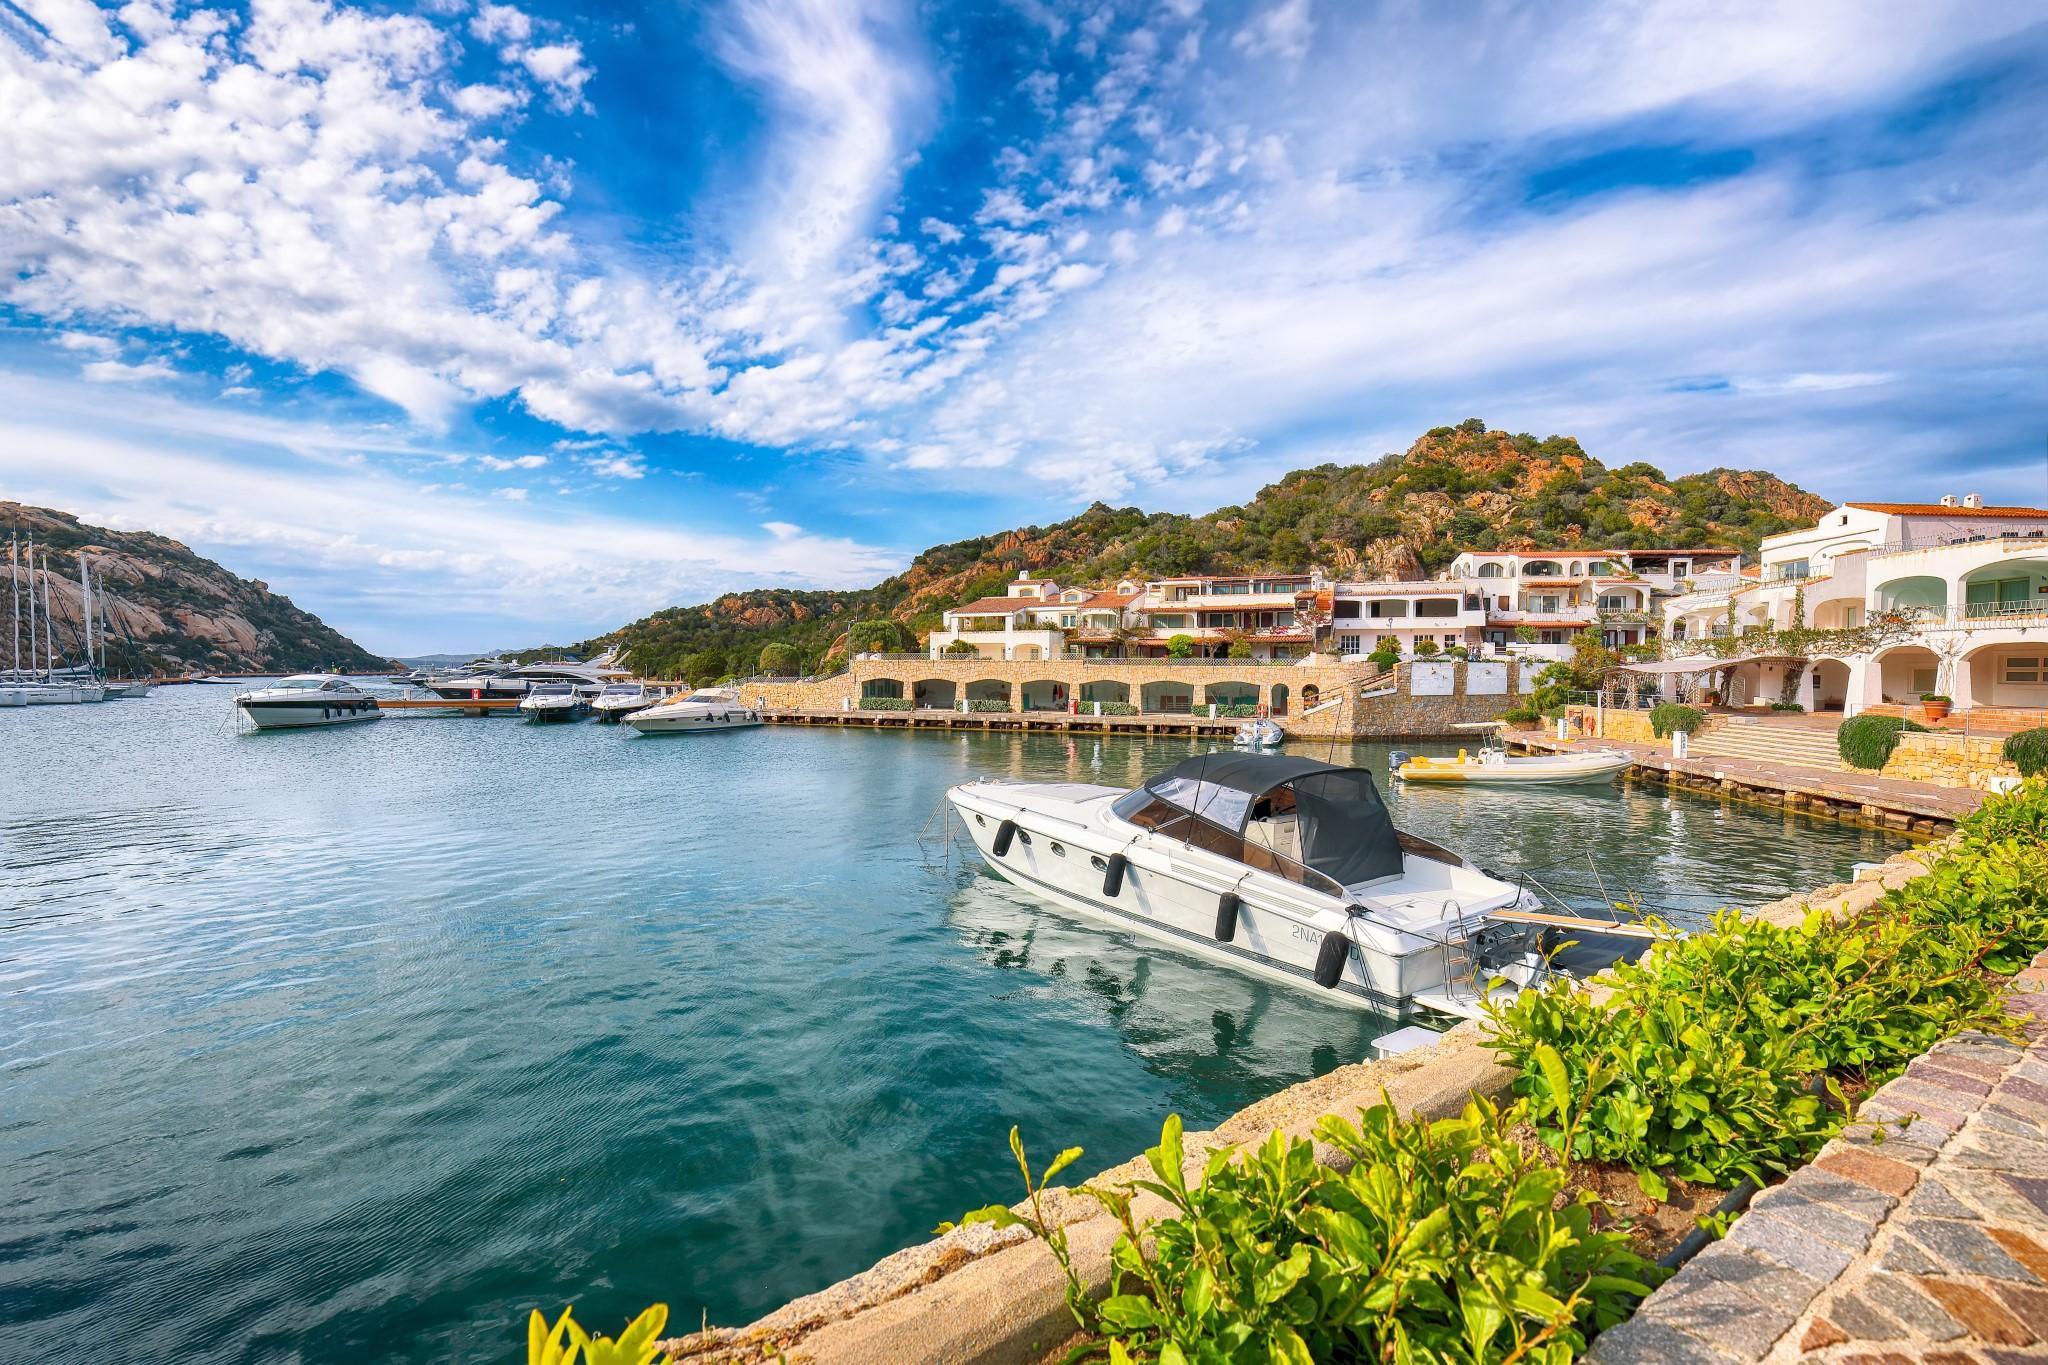 Astonishing view of Poltu Quatu port and bay with yachts and motorboats on Costa Smeralda. Popular travel destination of Mediterranean sea. Location: Poltu Quatu, Province of Sassari, Sardinia, Italy